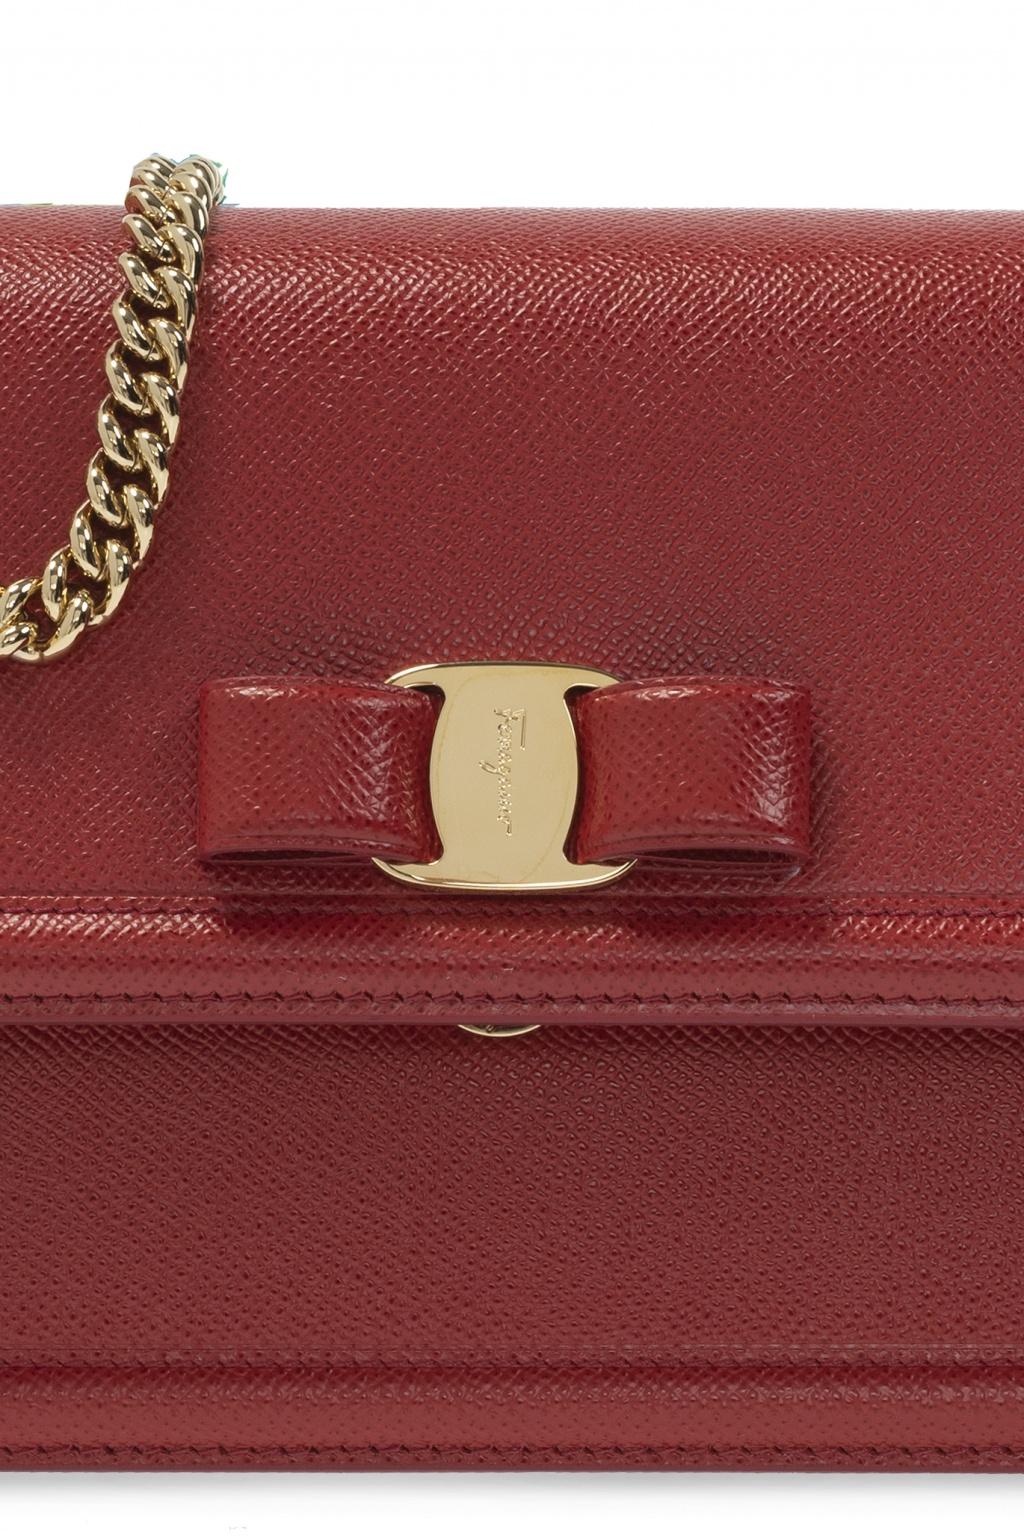 Salvatore Ferragamo 'Ginny' shoulder bag